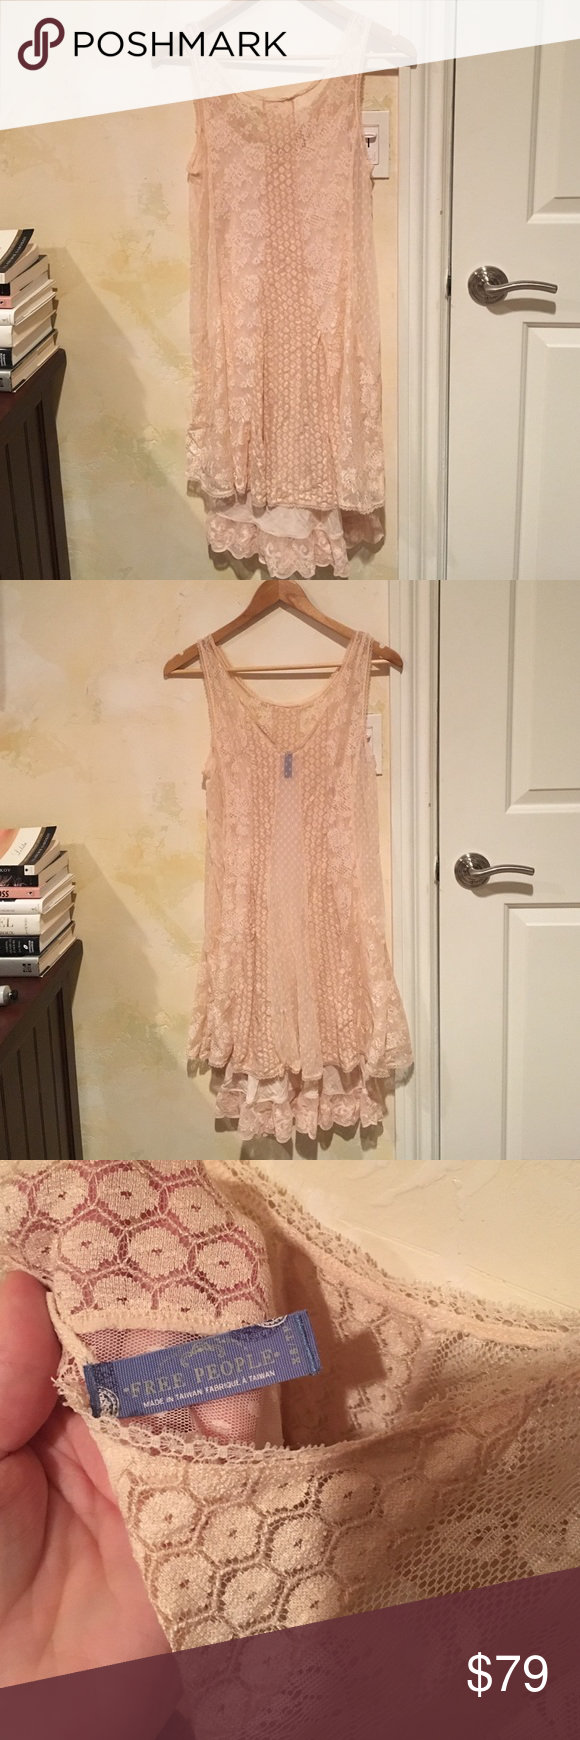 Free People Blush Colored Dress Xs Women S Feminine And Romantic  # Muebles Rodilla